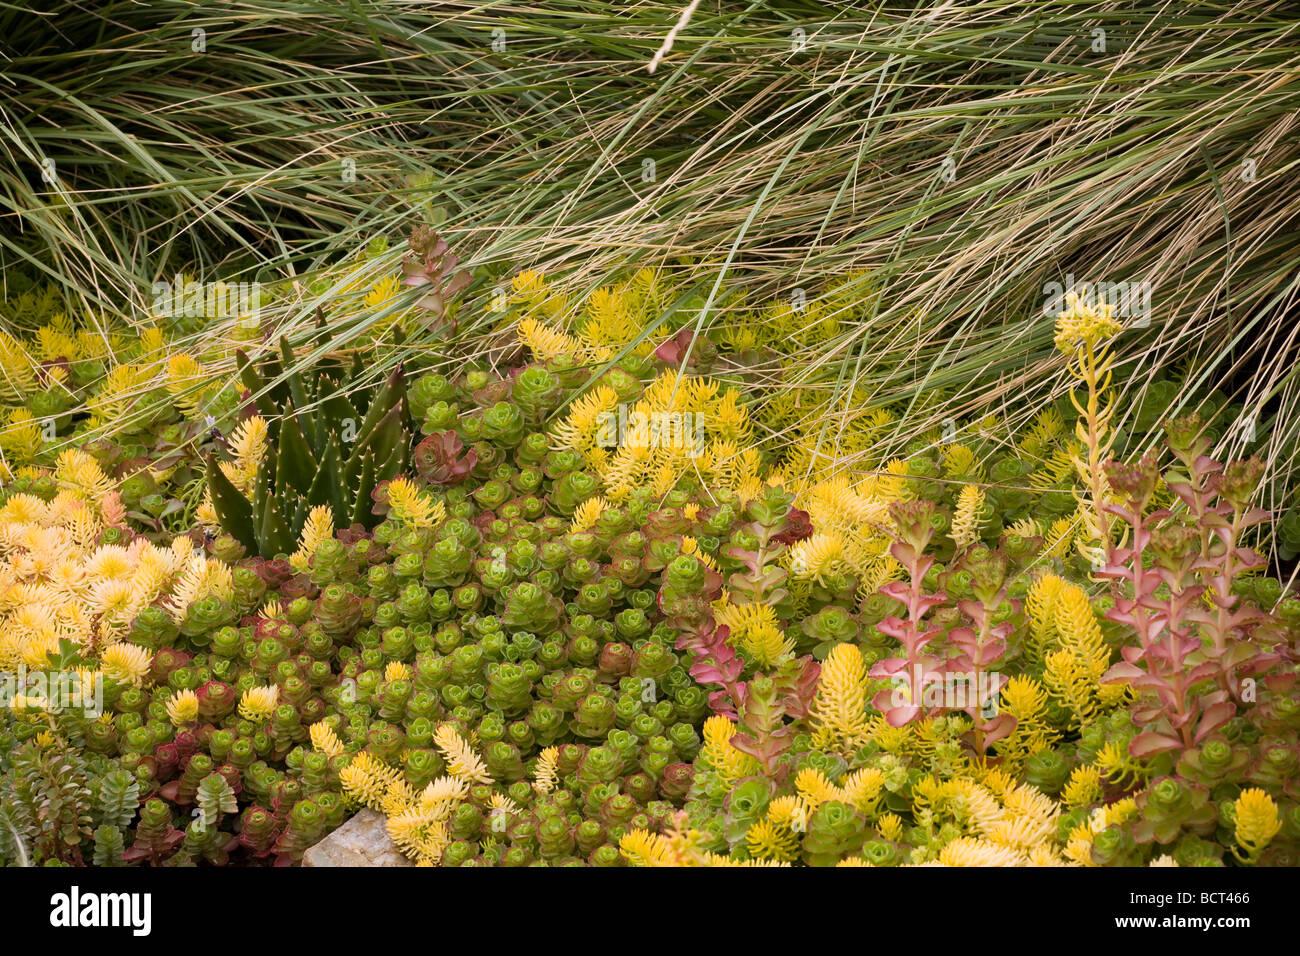 Drought tolerant succulent groundcover foliage tapestry with sedum drought tolerant succulent groundcover foliage tapestry with sedum spurium and yellow foliage s angelina in california garden mightylinksfo